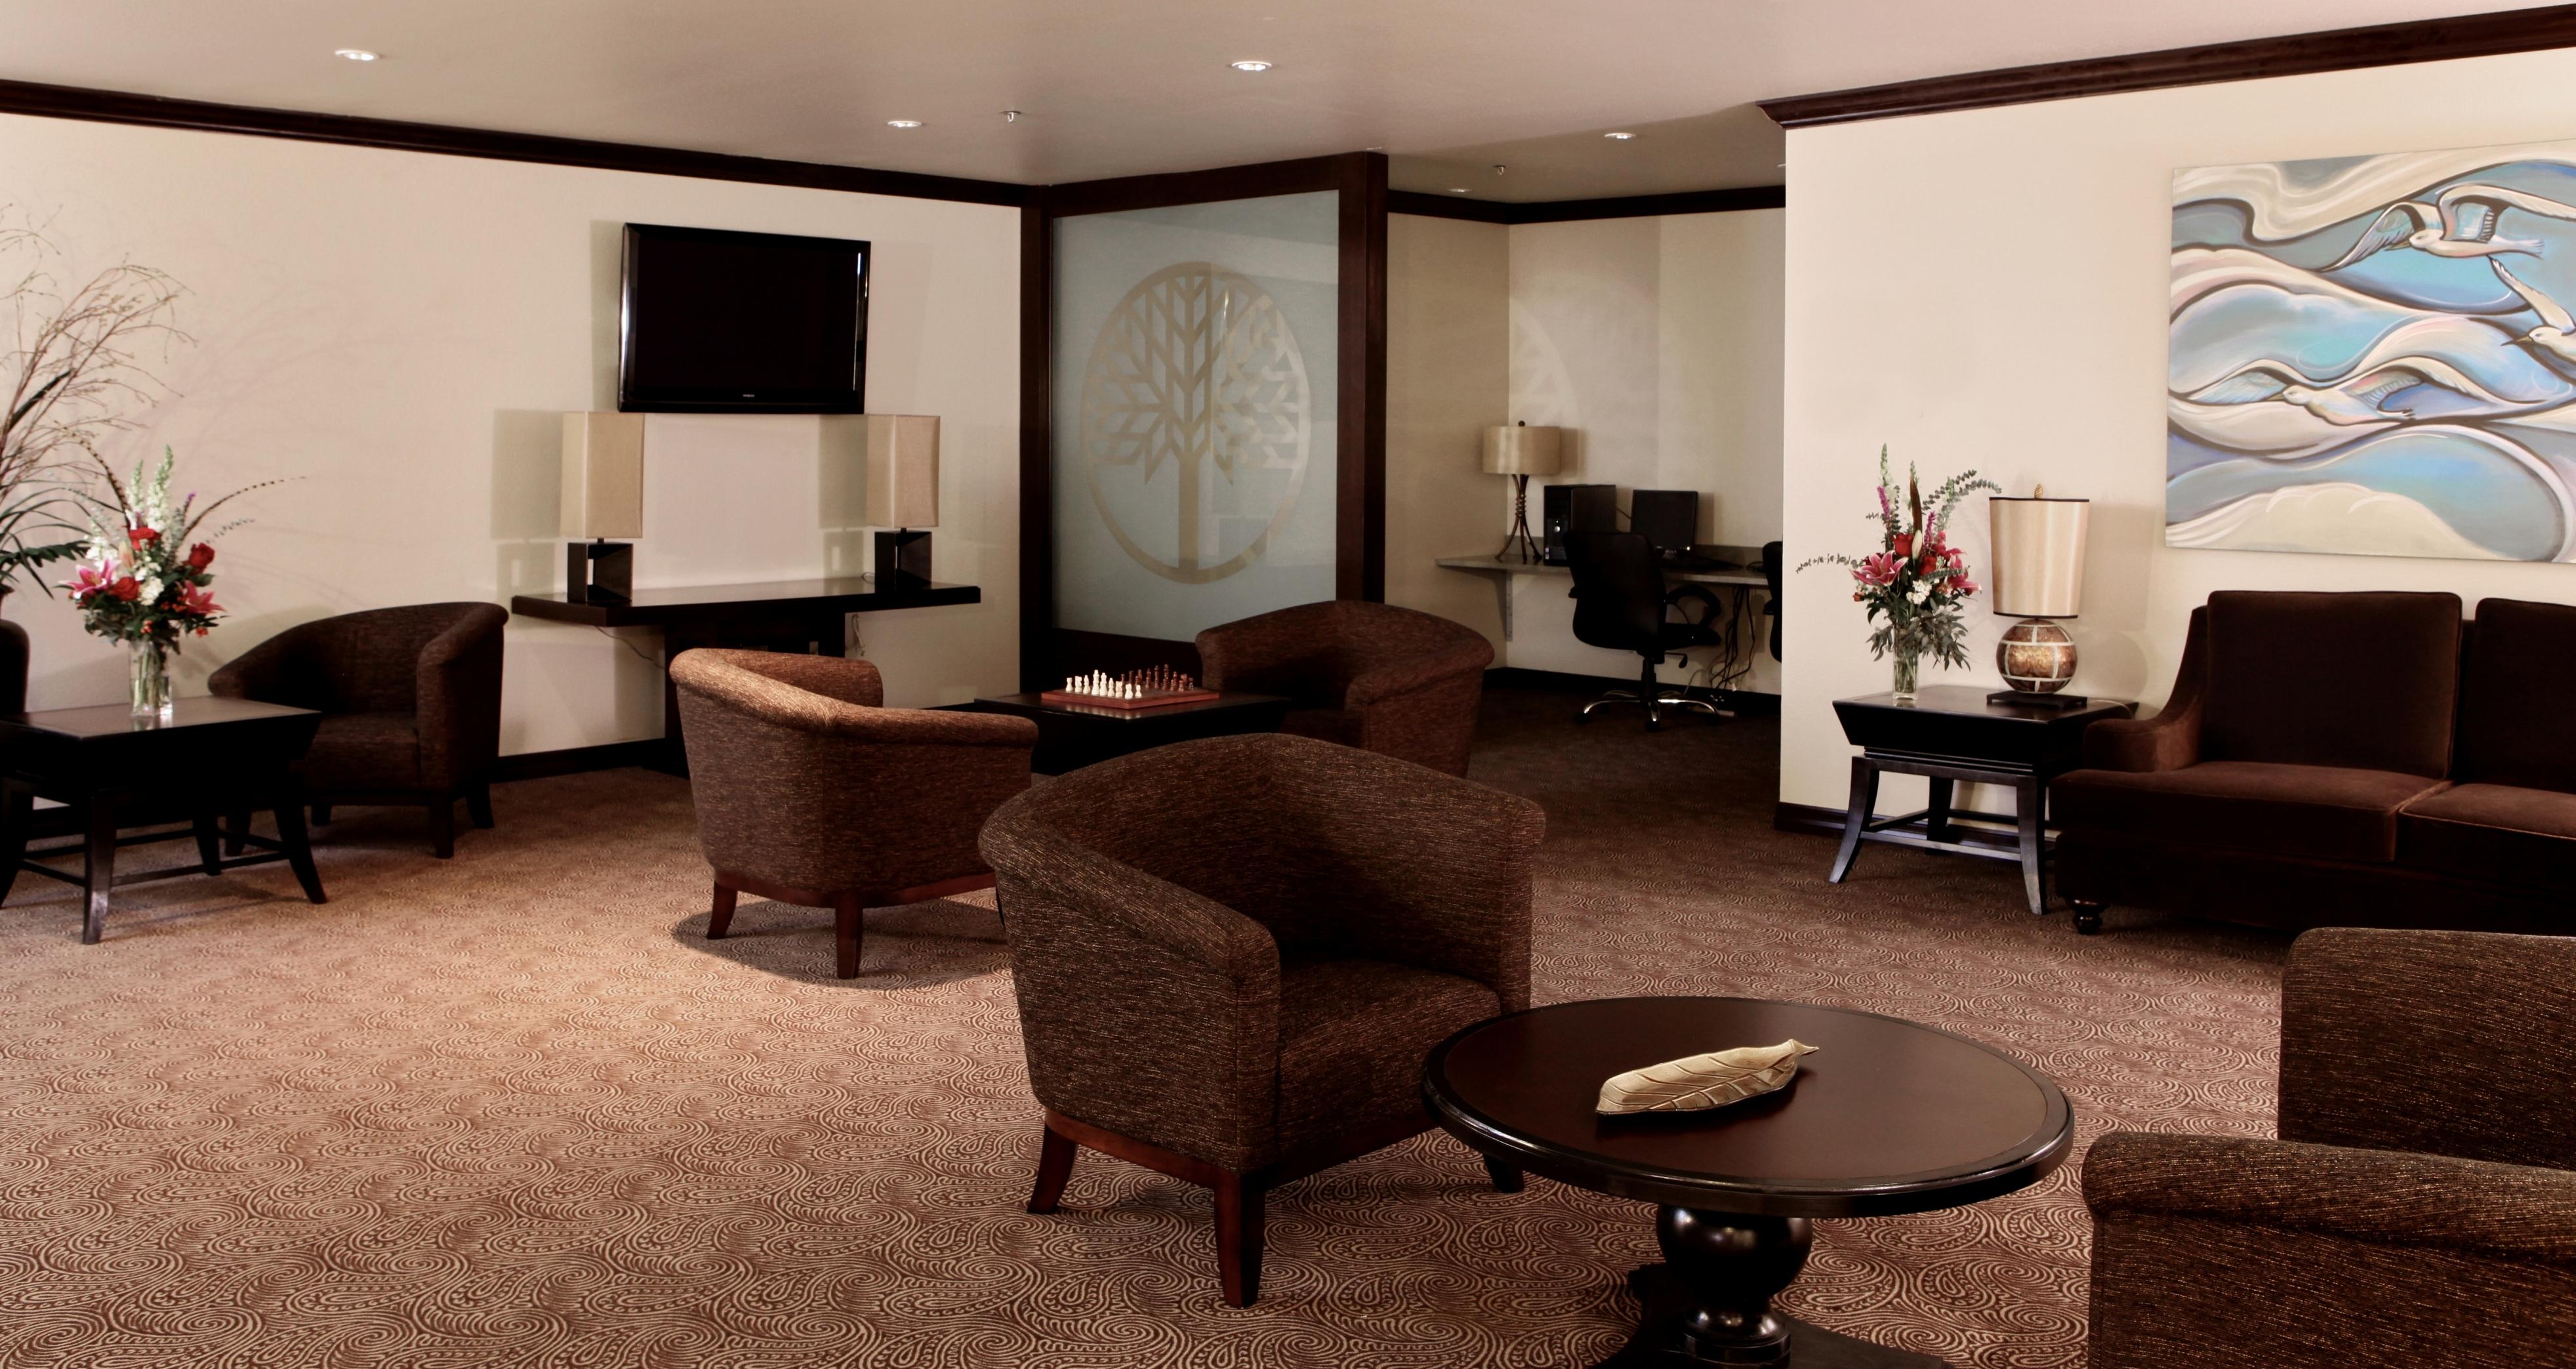 Hawthorn Suites by Wyndham Lubbock image 6